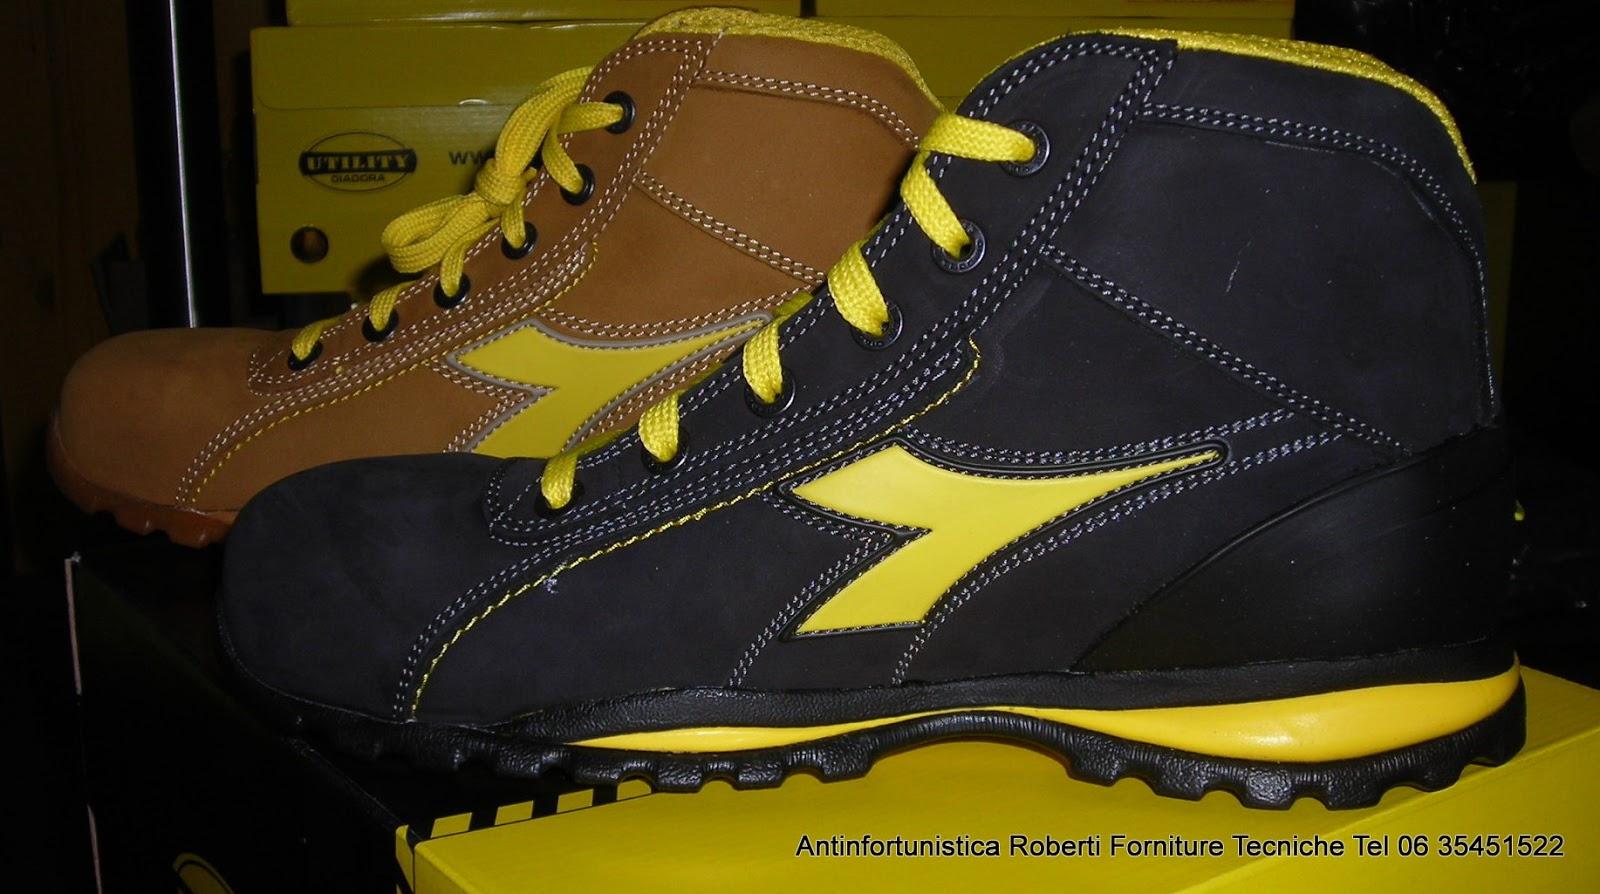 Diadora Blog Roberti Calzature Antinfortunistica Scarpe qzOtx5xw ce6aa0b12a5